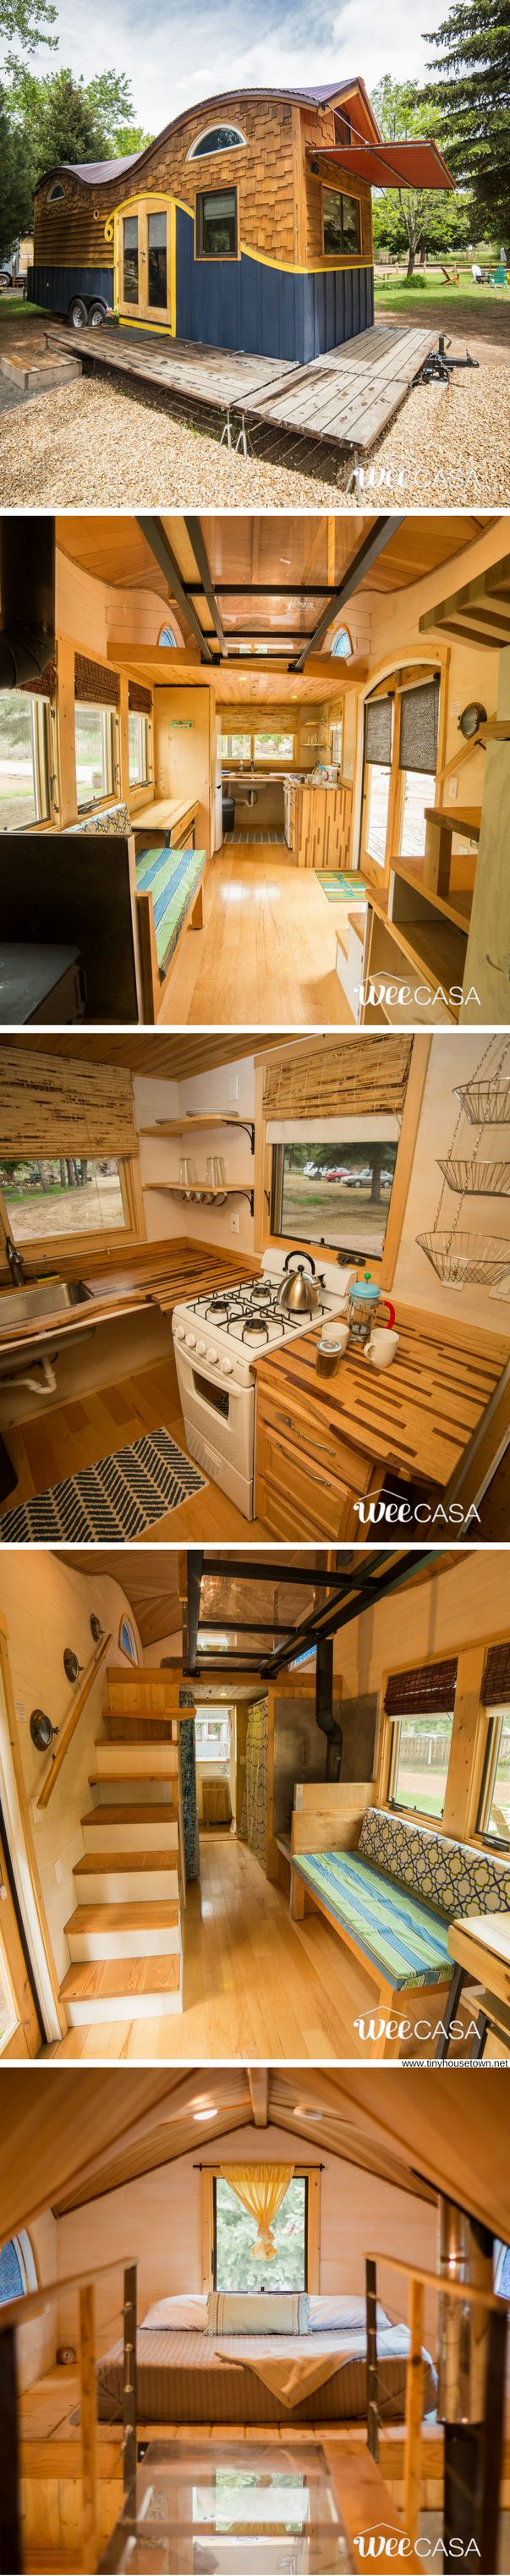 The Pequod: a beautifully designed tiny house at the WeeCasa Tiny House Resort